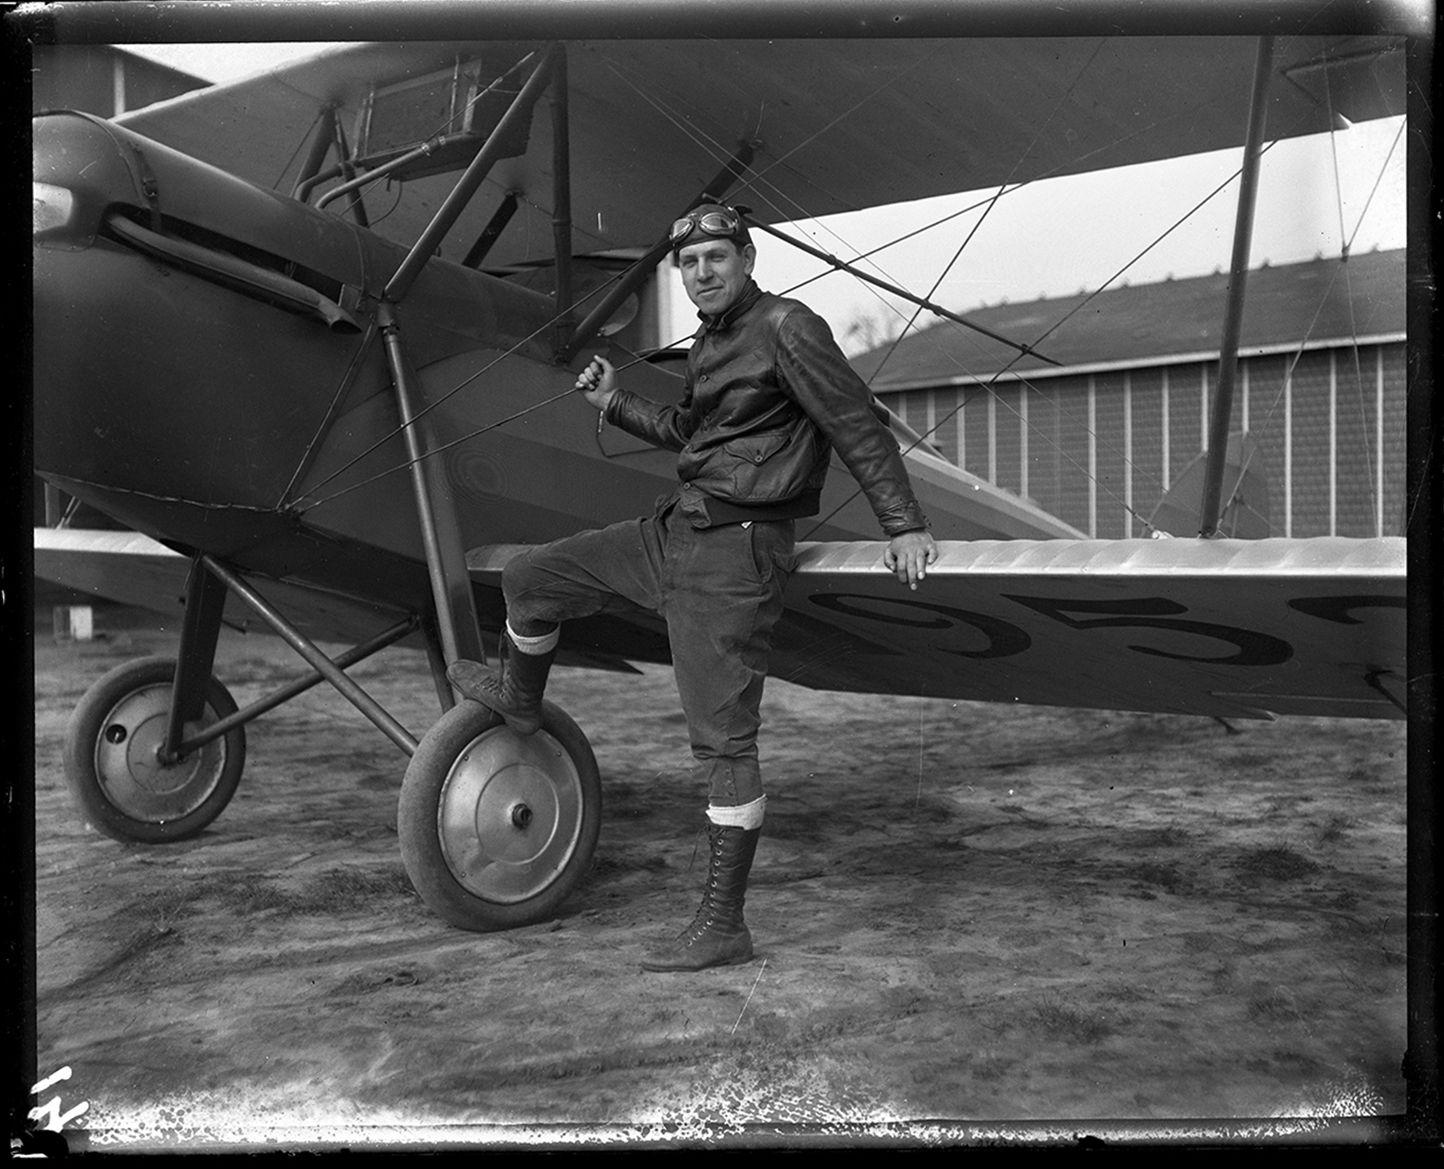 Gelder Lockwood and biplane at Southwest Airport, circa